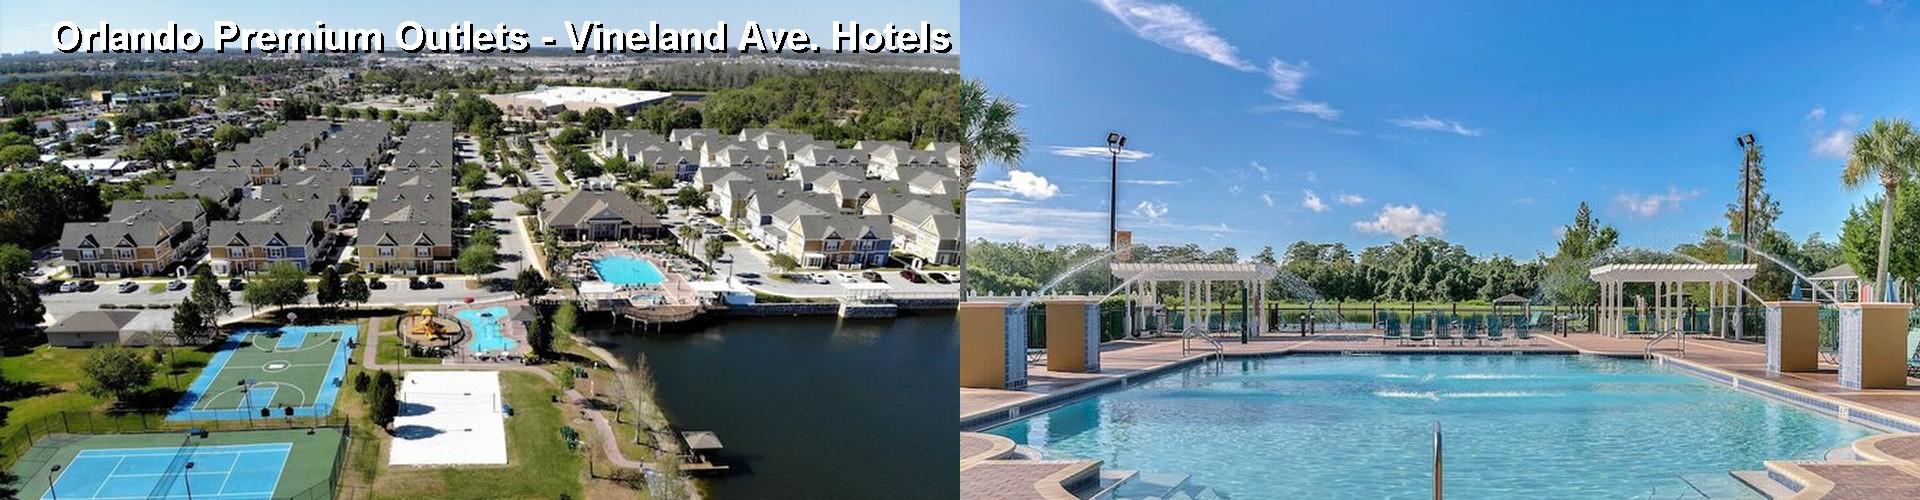 41 hotels near orlando premium outlets vineland ave fl